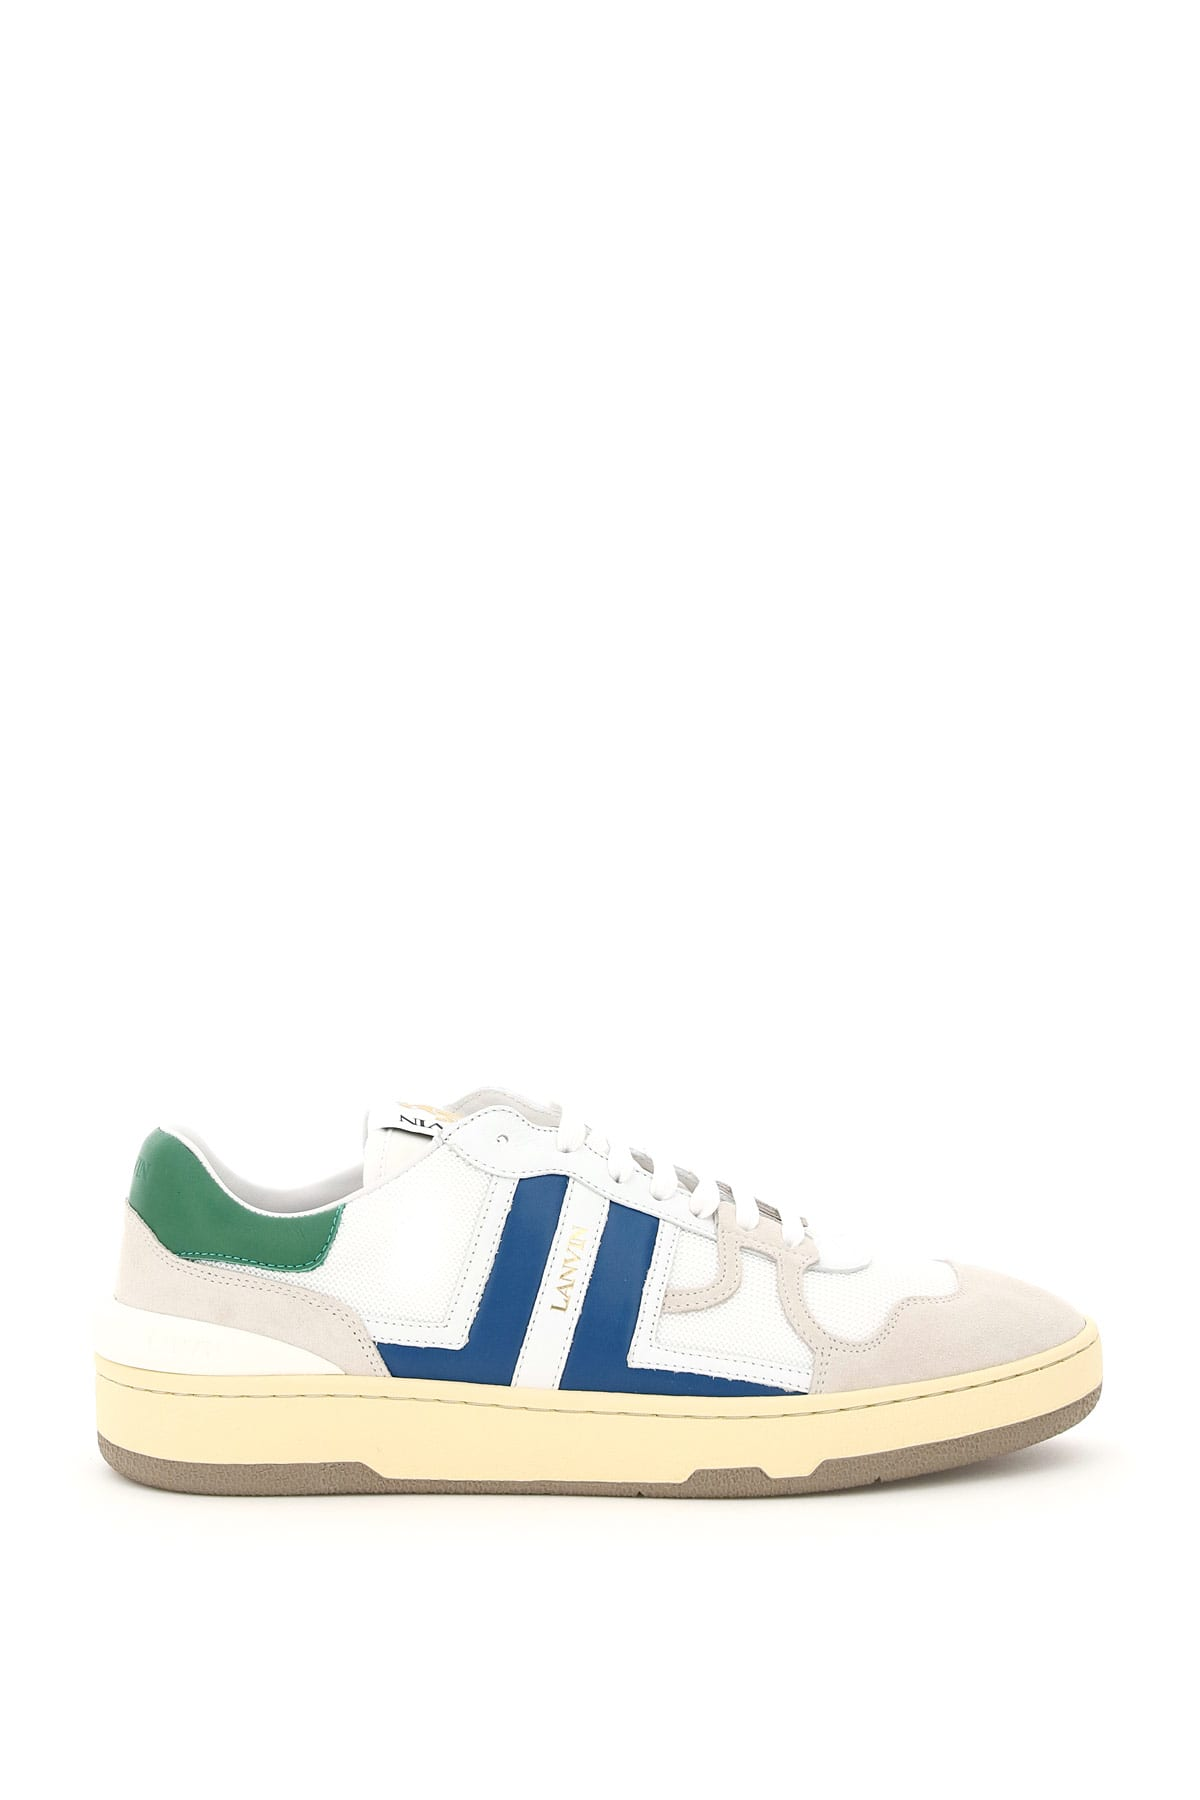 Lanvin Clay Sneakers